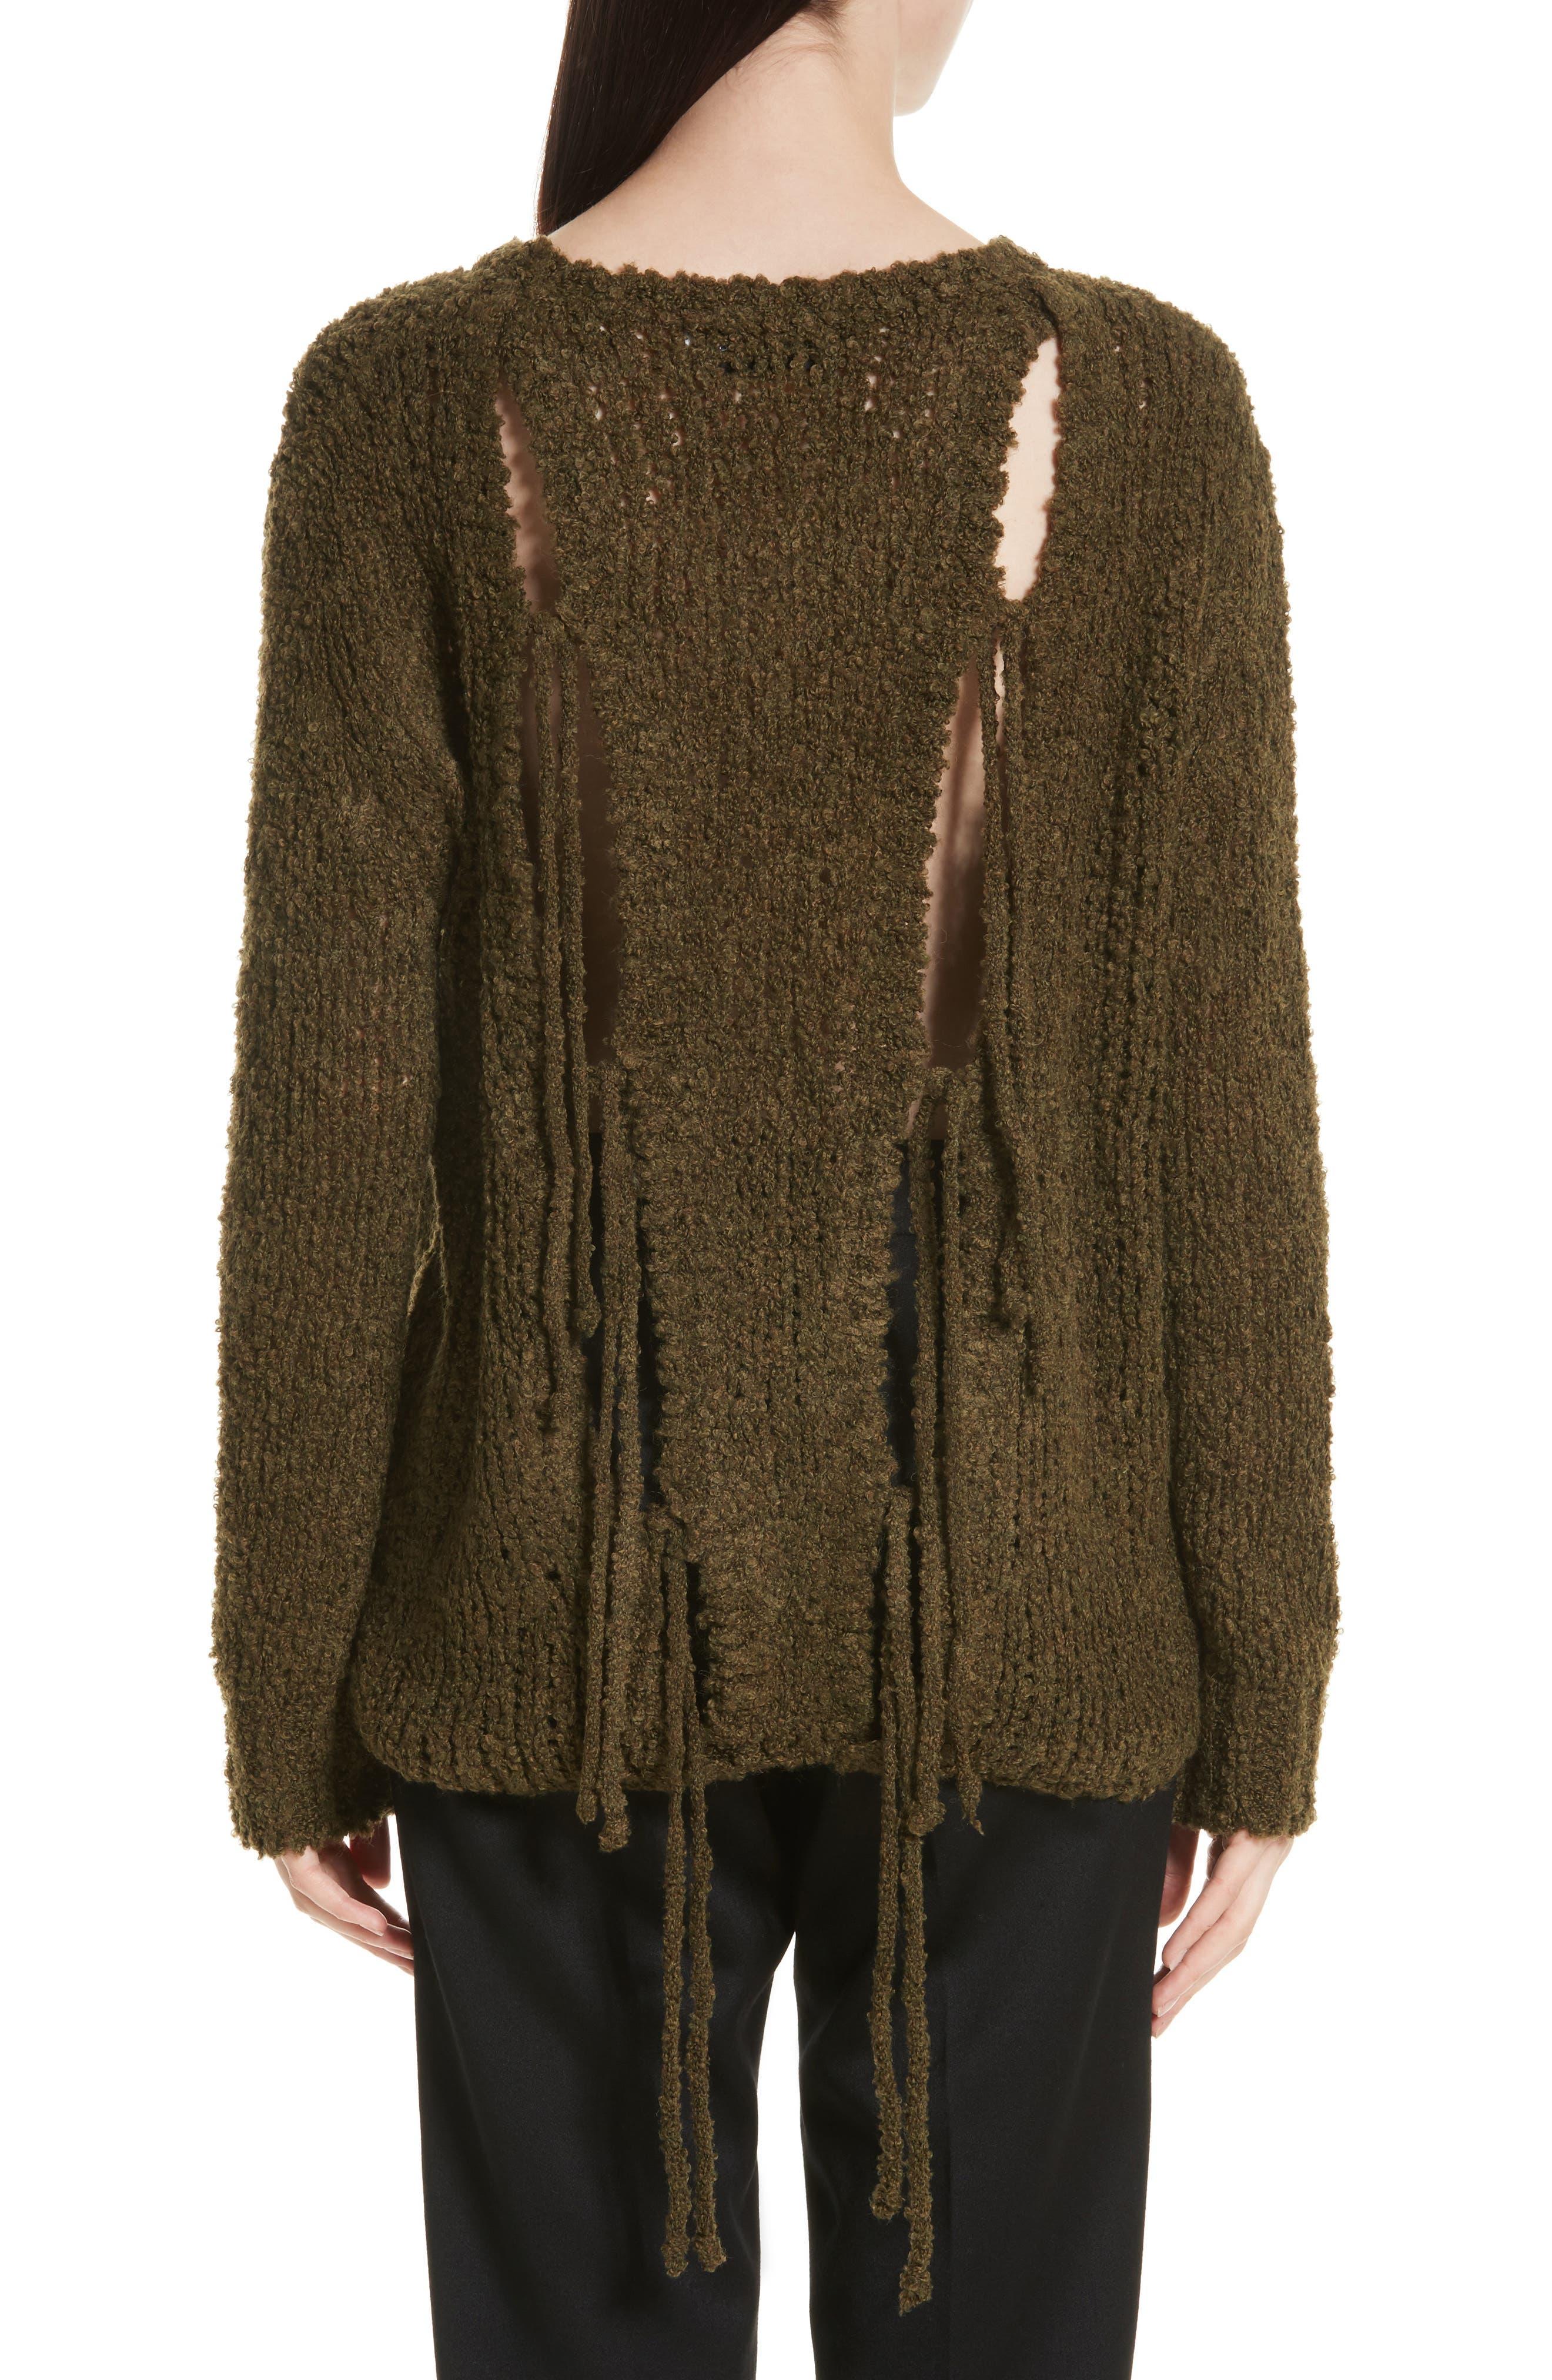 Cresent Cutout Sweater,                             Alternate thumbnail 2, color,                             300